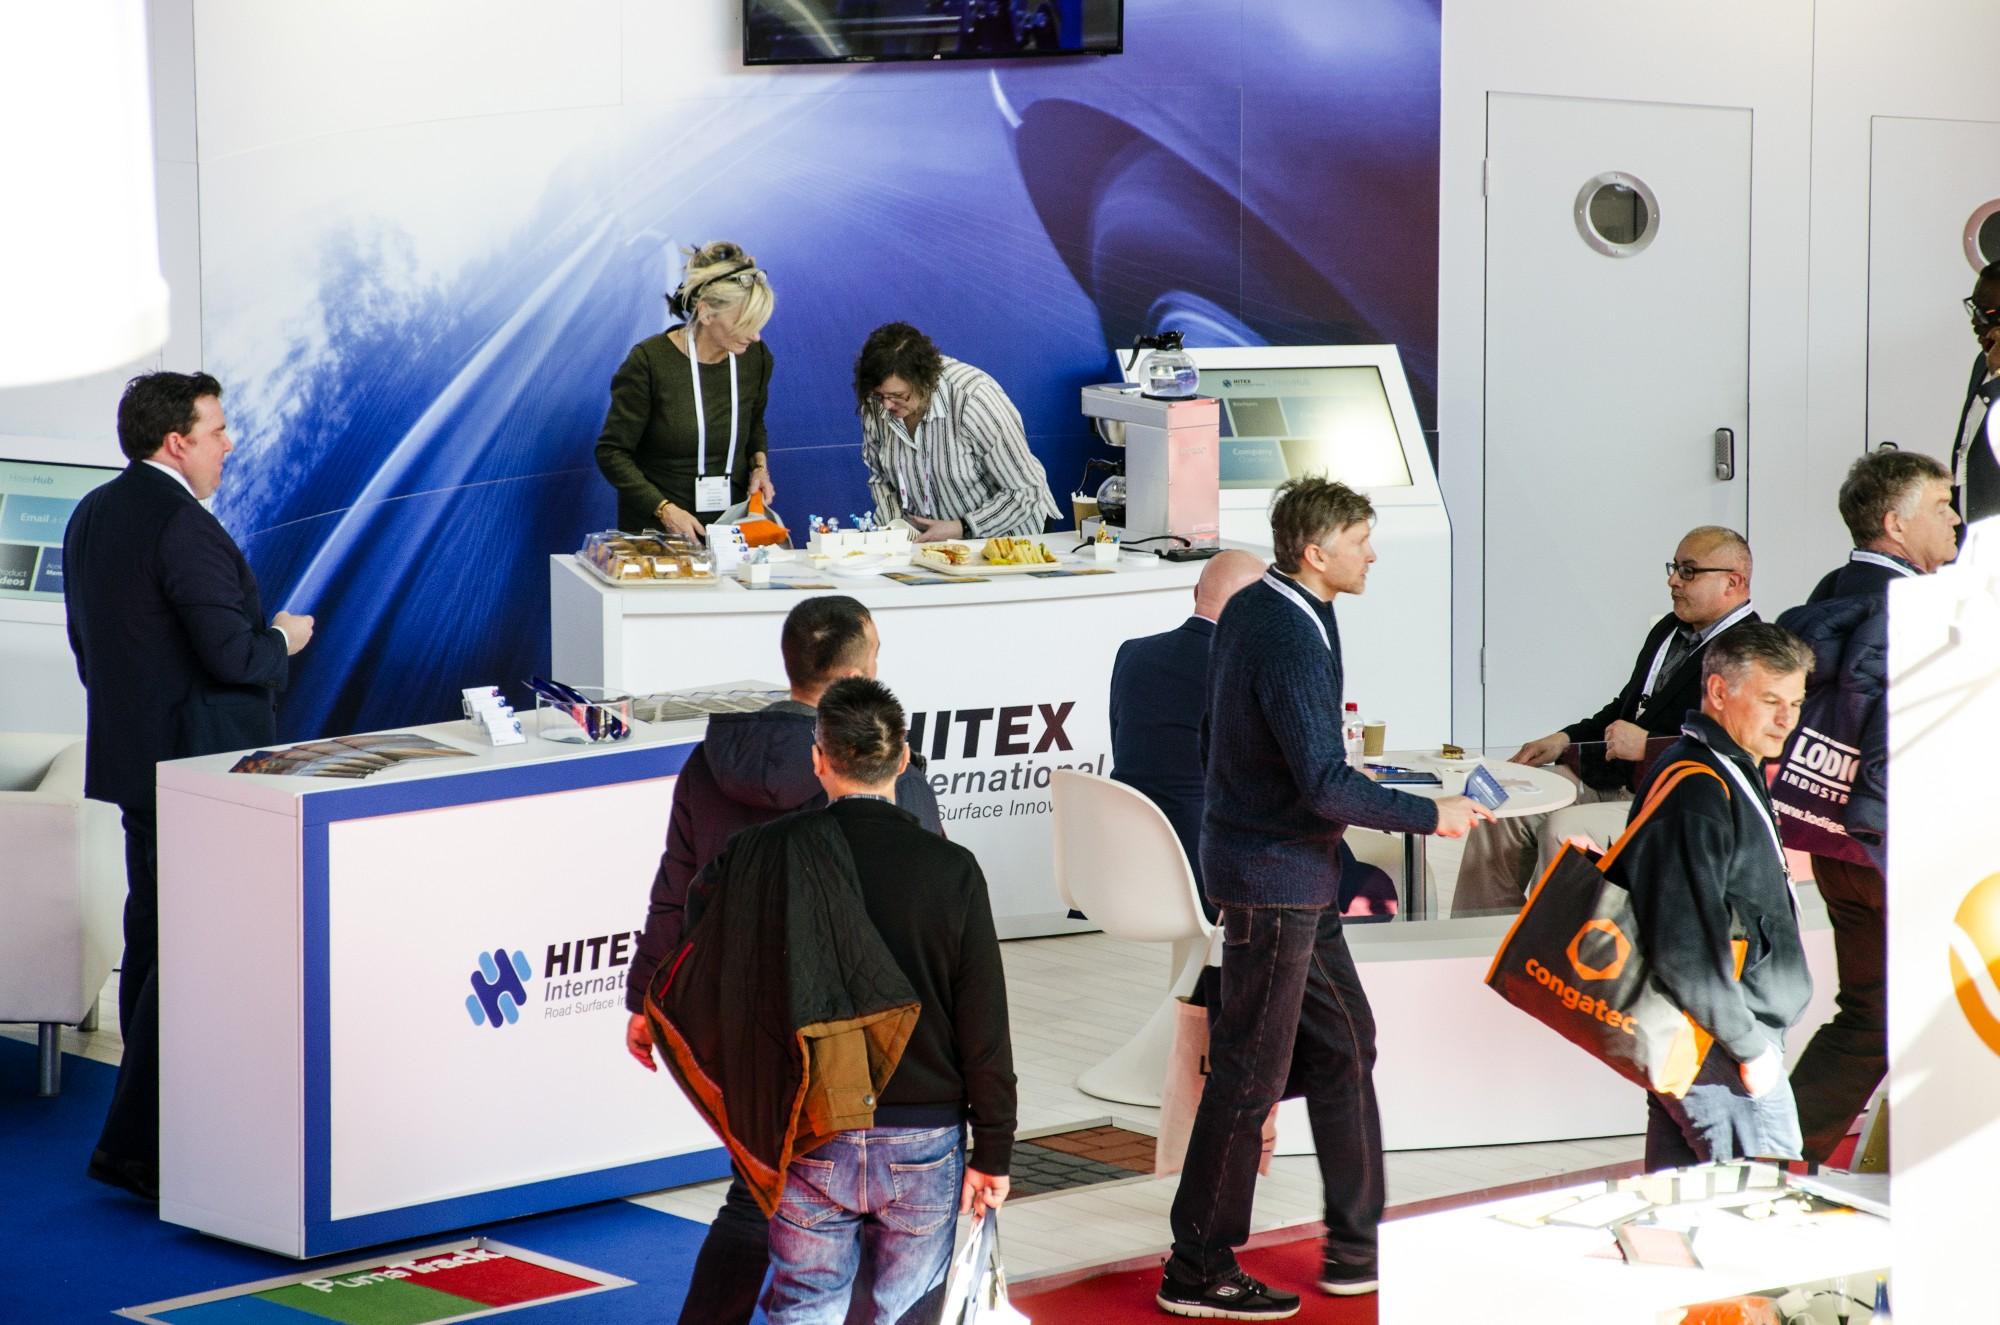 Hitex at Intertraffic 2018 32